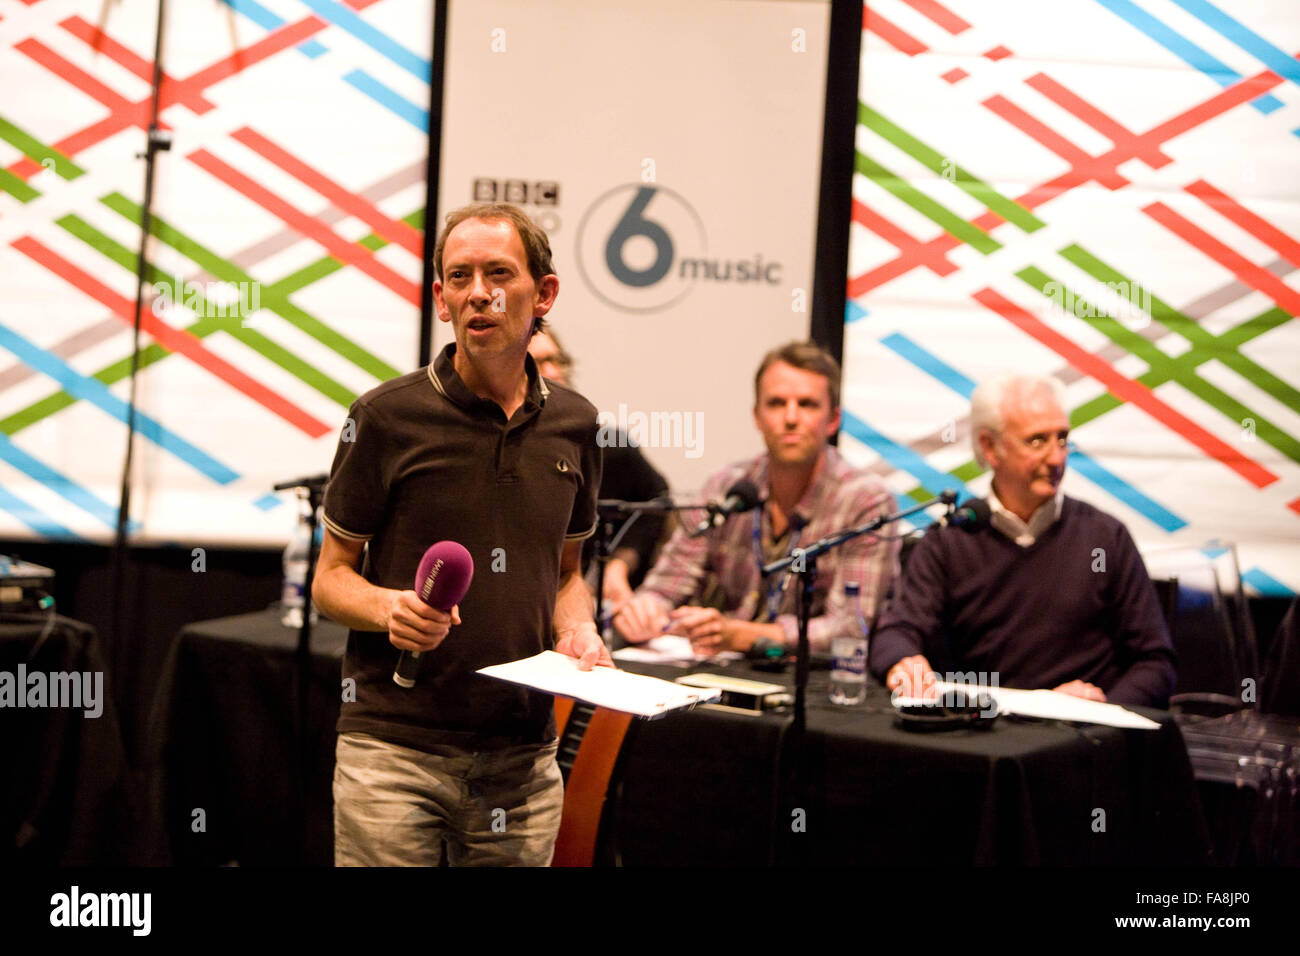 BBC Radio 5 Live Octoberfest in Sheffield Thursday Steve Lamacq DJ BBC radio 6 music Stock Photo